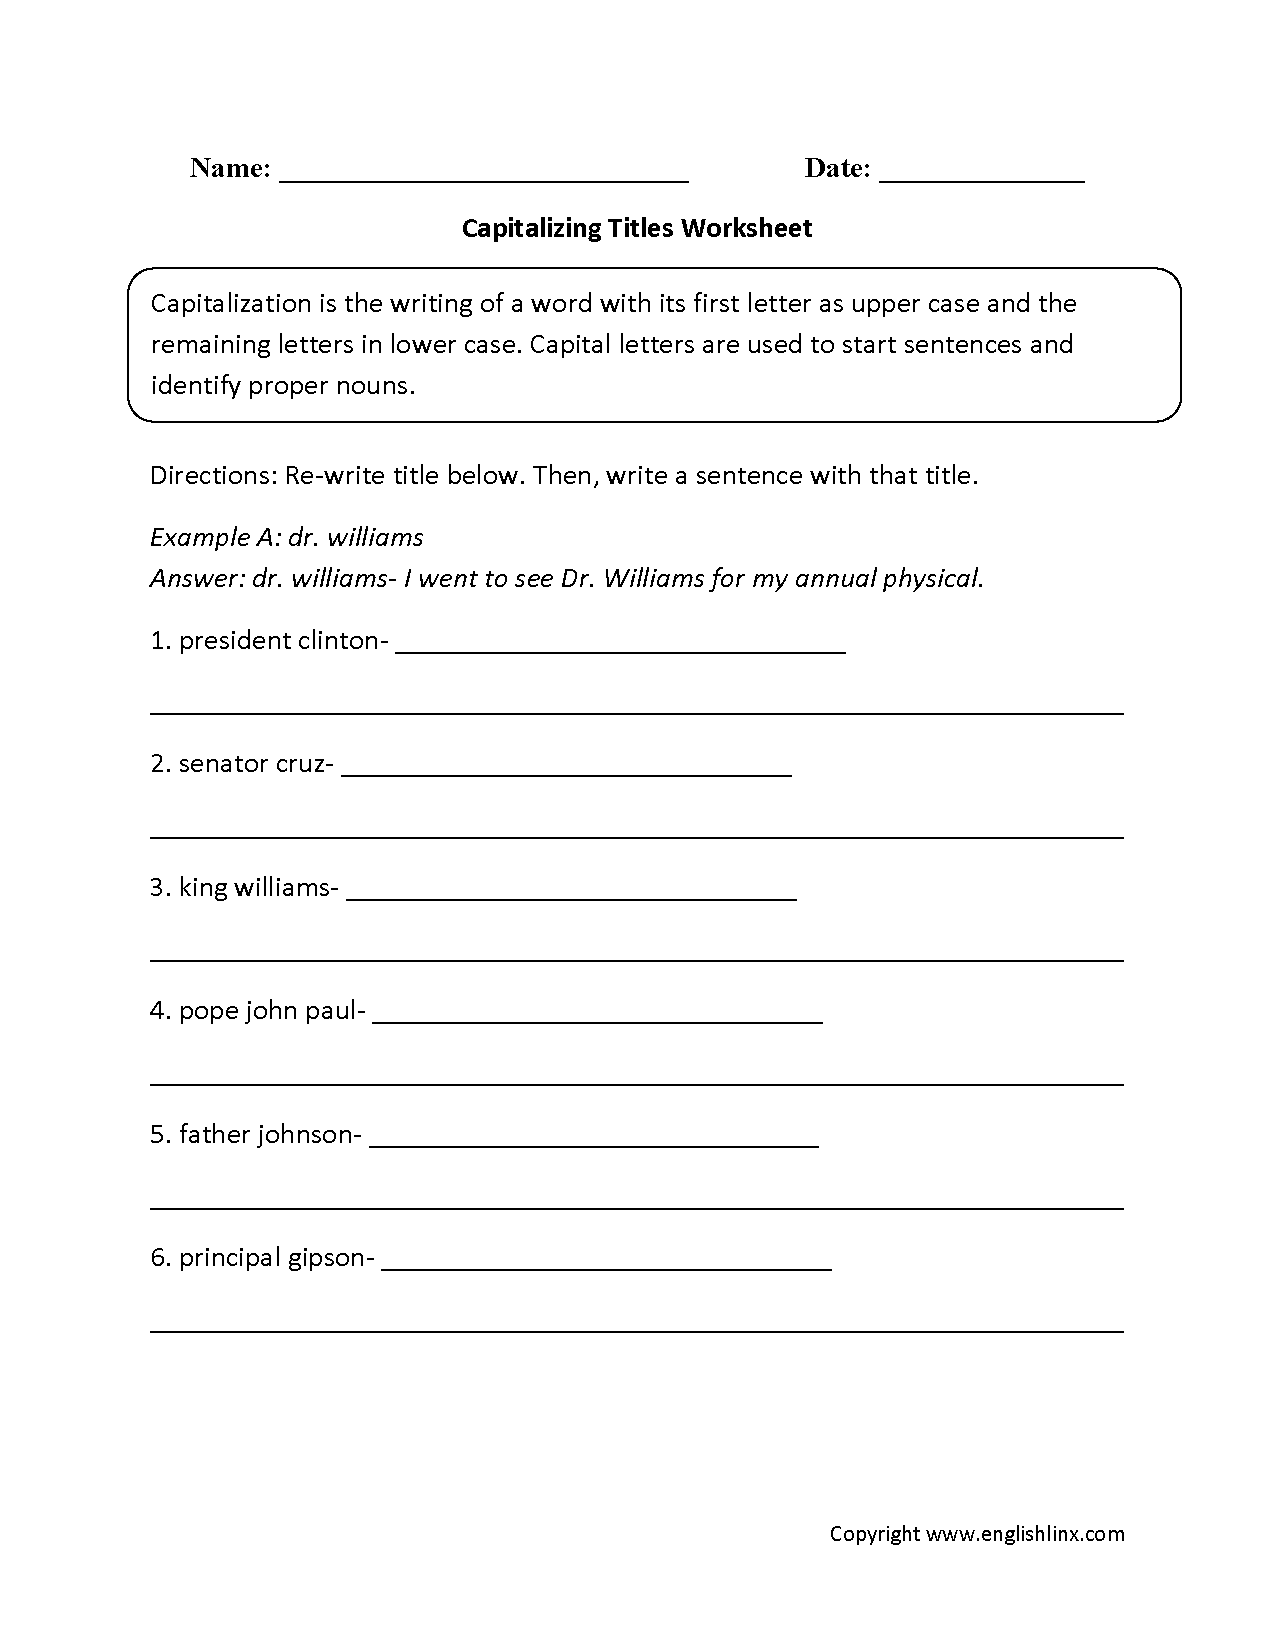 Capitalizing Titles Worksheet   Capitalization worksheets [ 1650 x 1275 Pixel ]